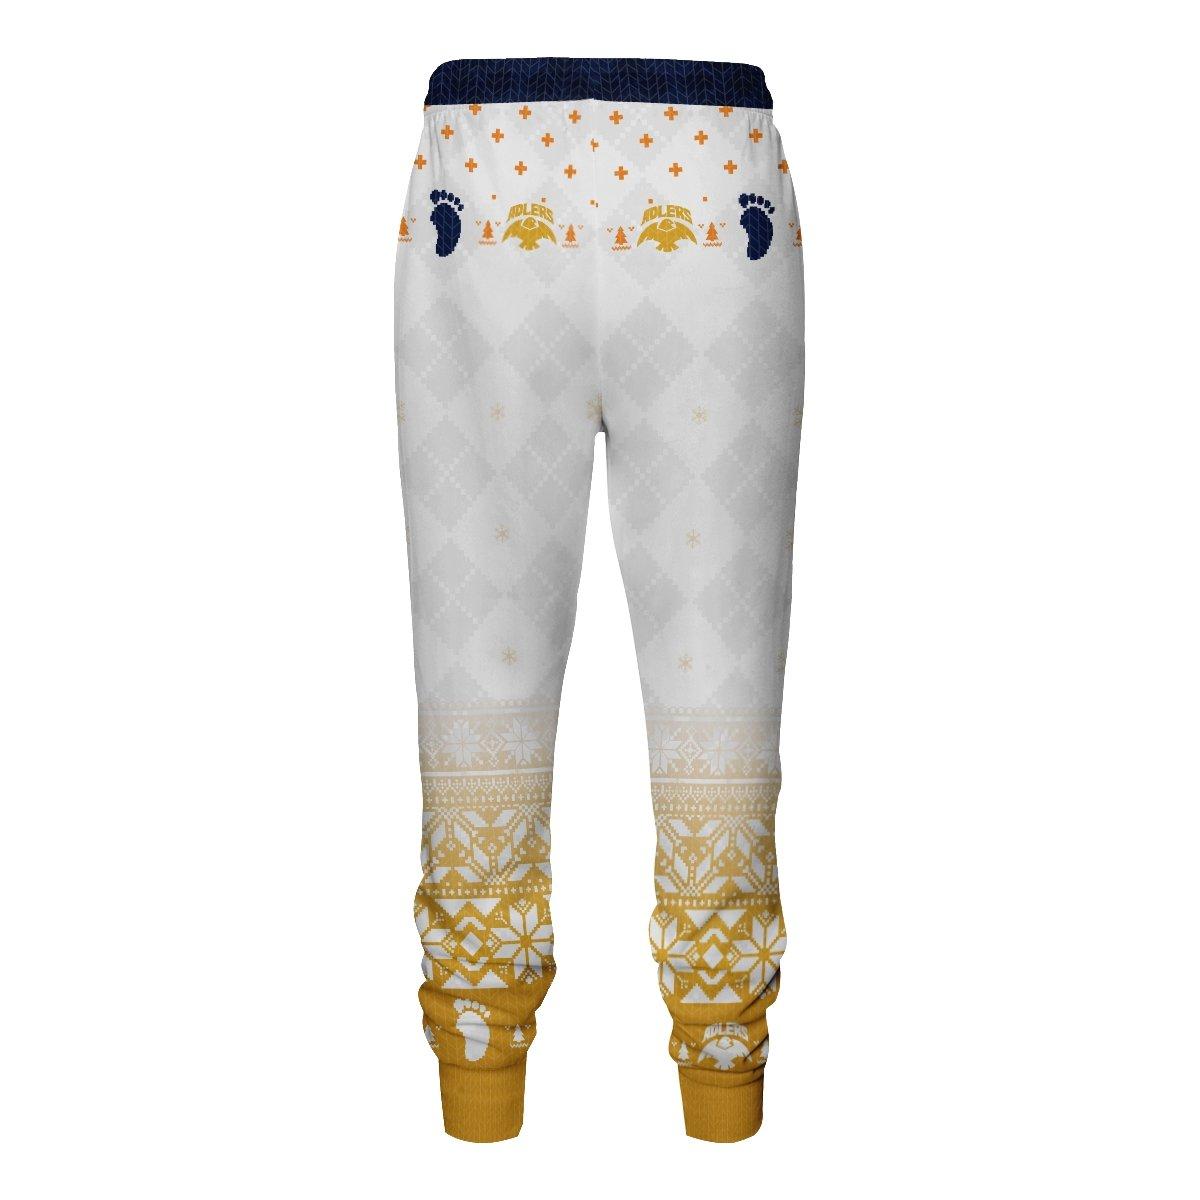 team schweiden adlers christmas jogger pants 129757 - Otaku Treat